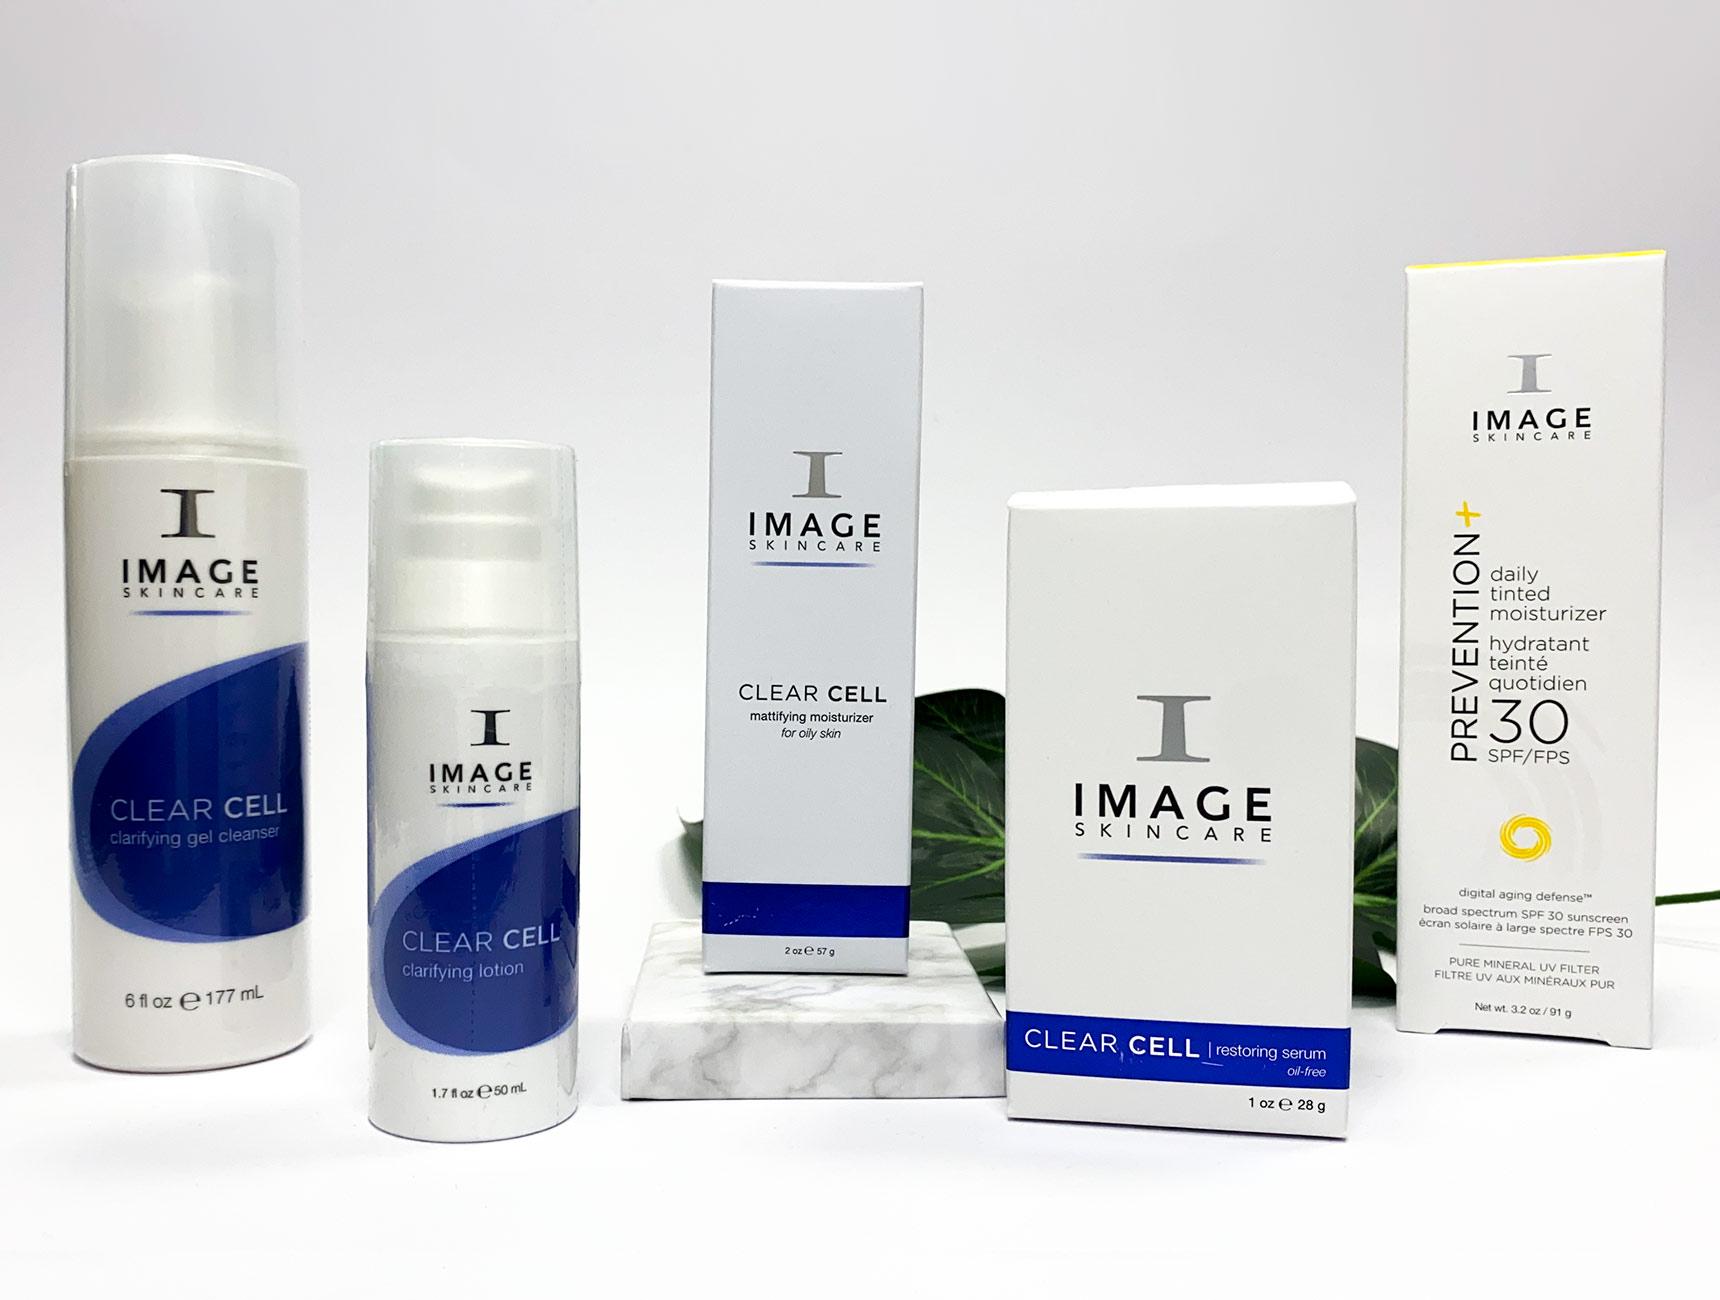 Image Skincare routine acne